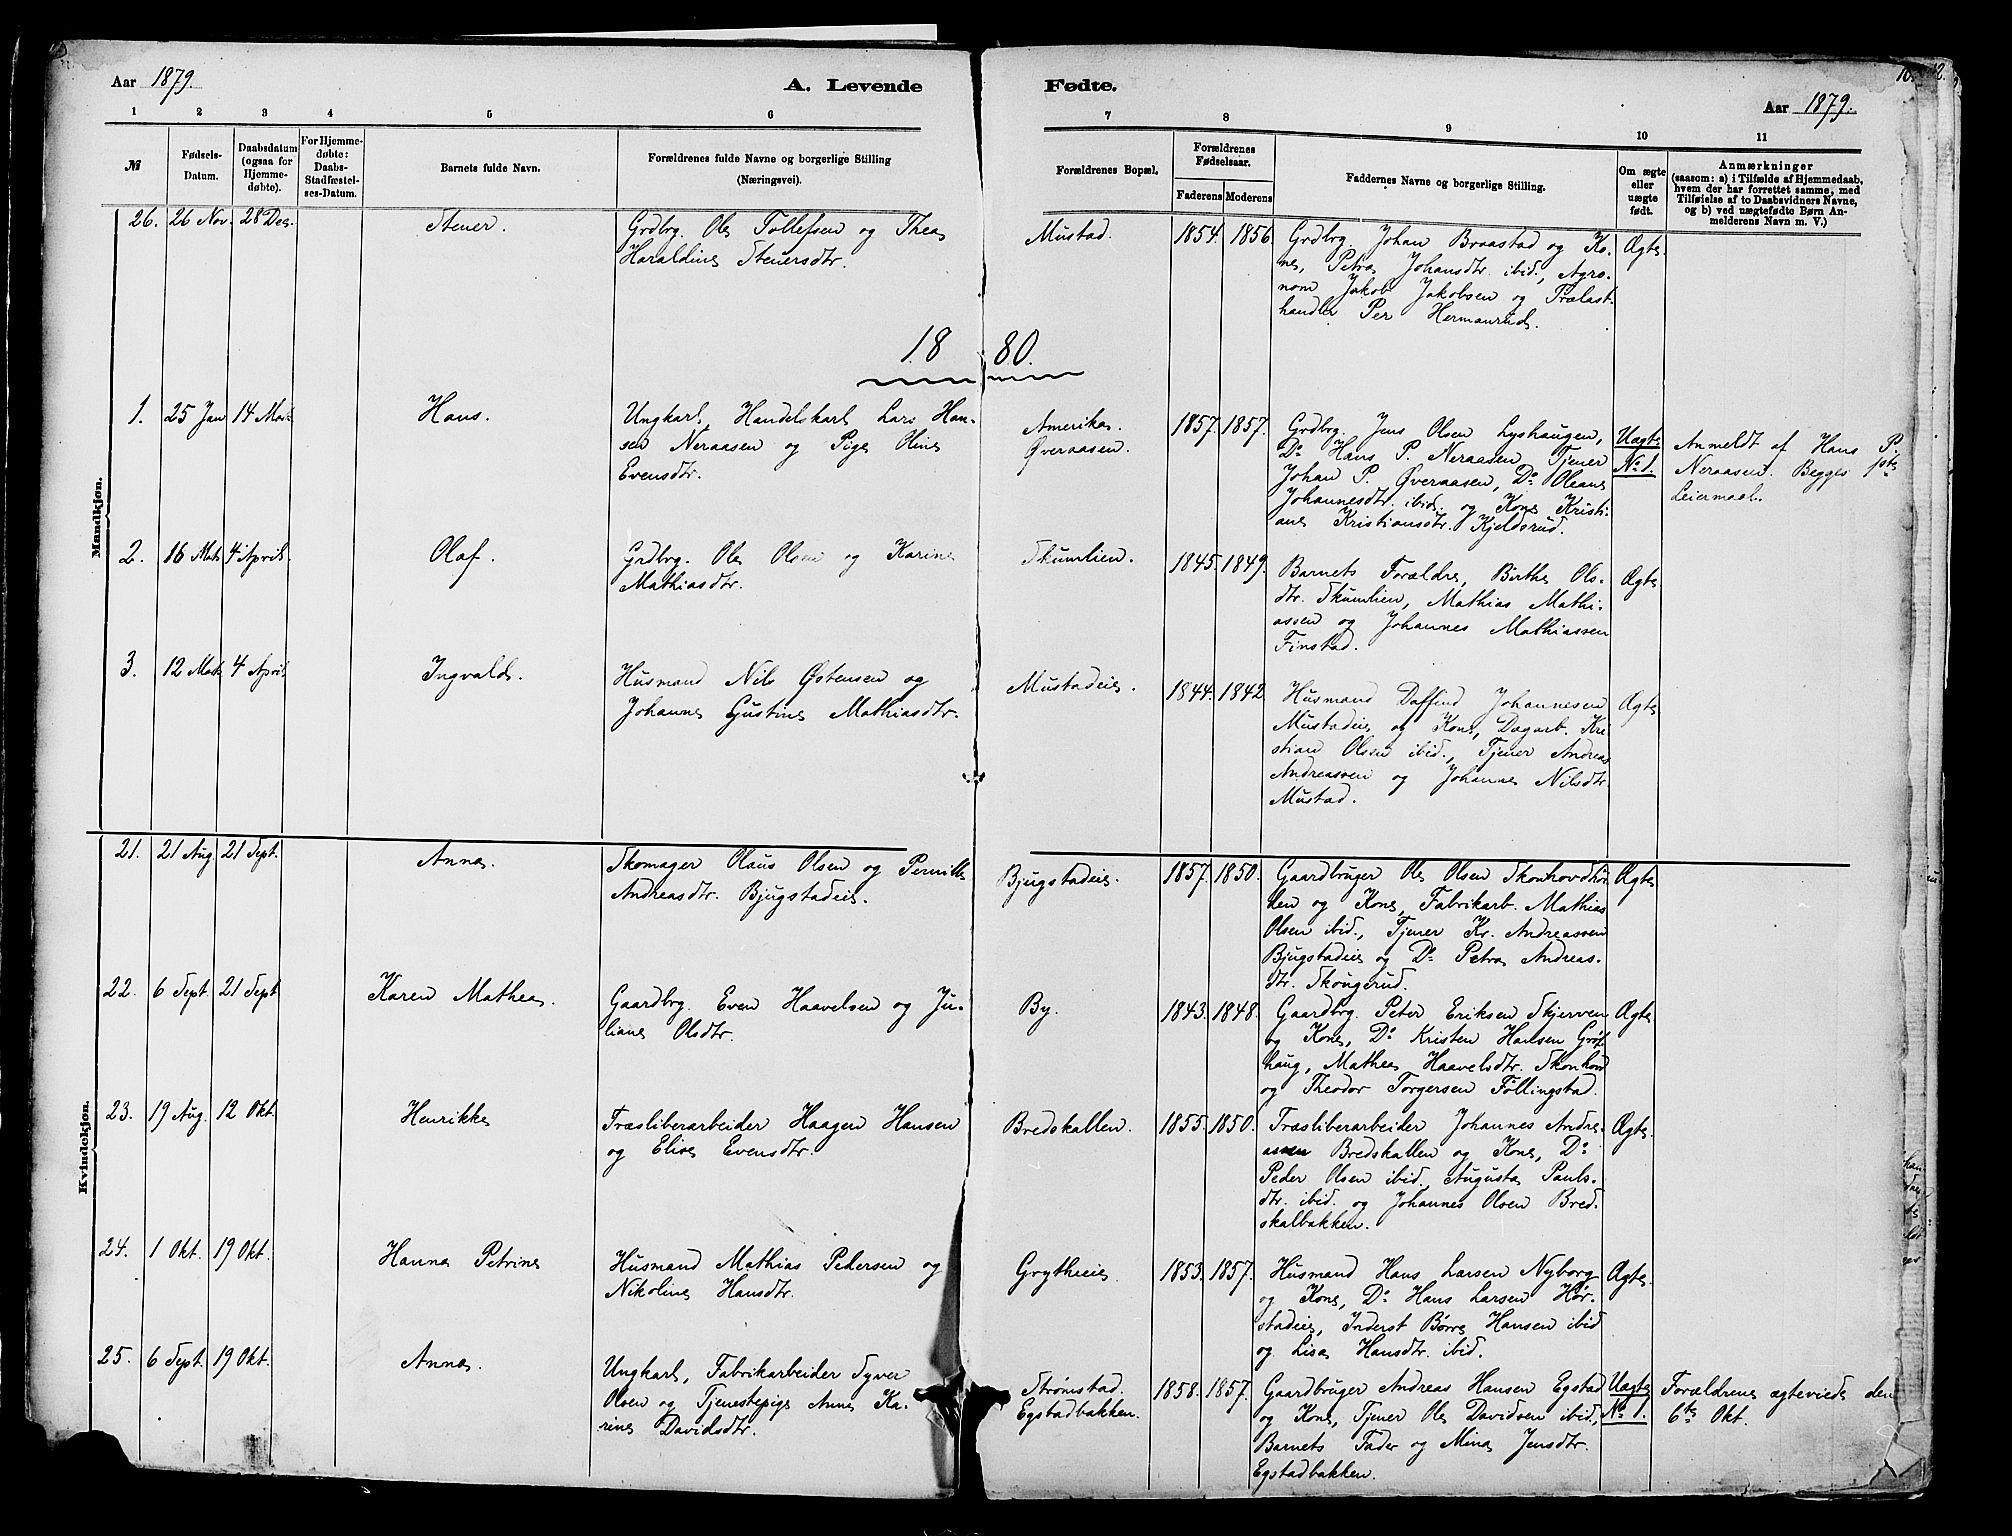 SAH, Vardal prestekontor, H/Ha/Haa/L0010: Ministerialbok nr. 10, 1878-1893, s. 10